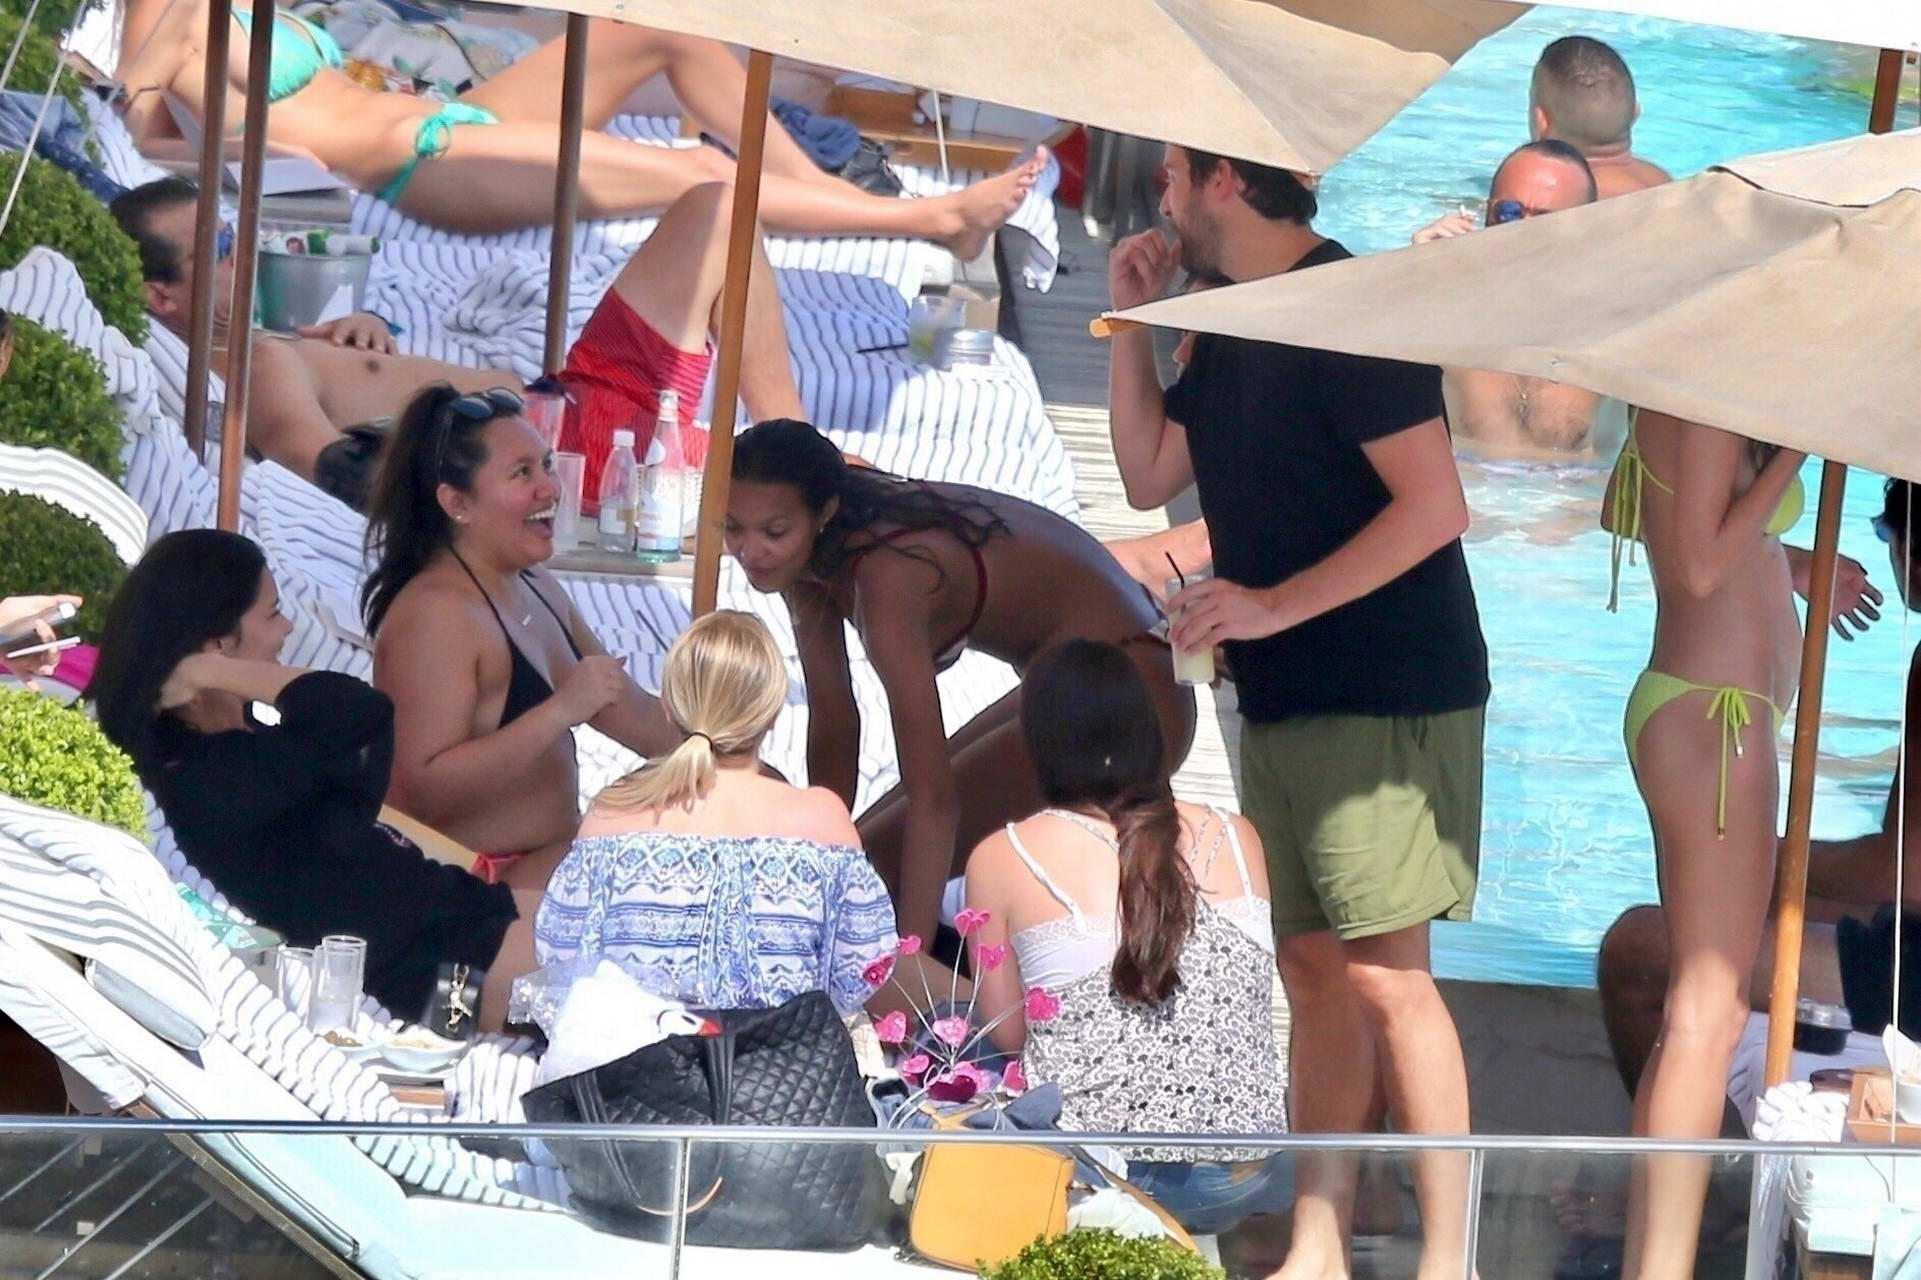 Lais Ribeiro and Adriana Lima lounge at Fasano's pool in Rio de Janeiro, Brazil